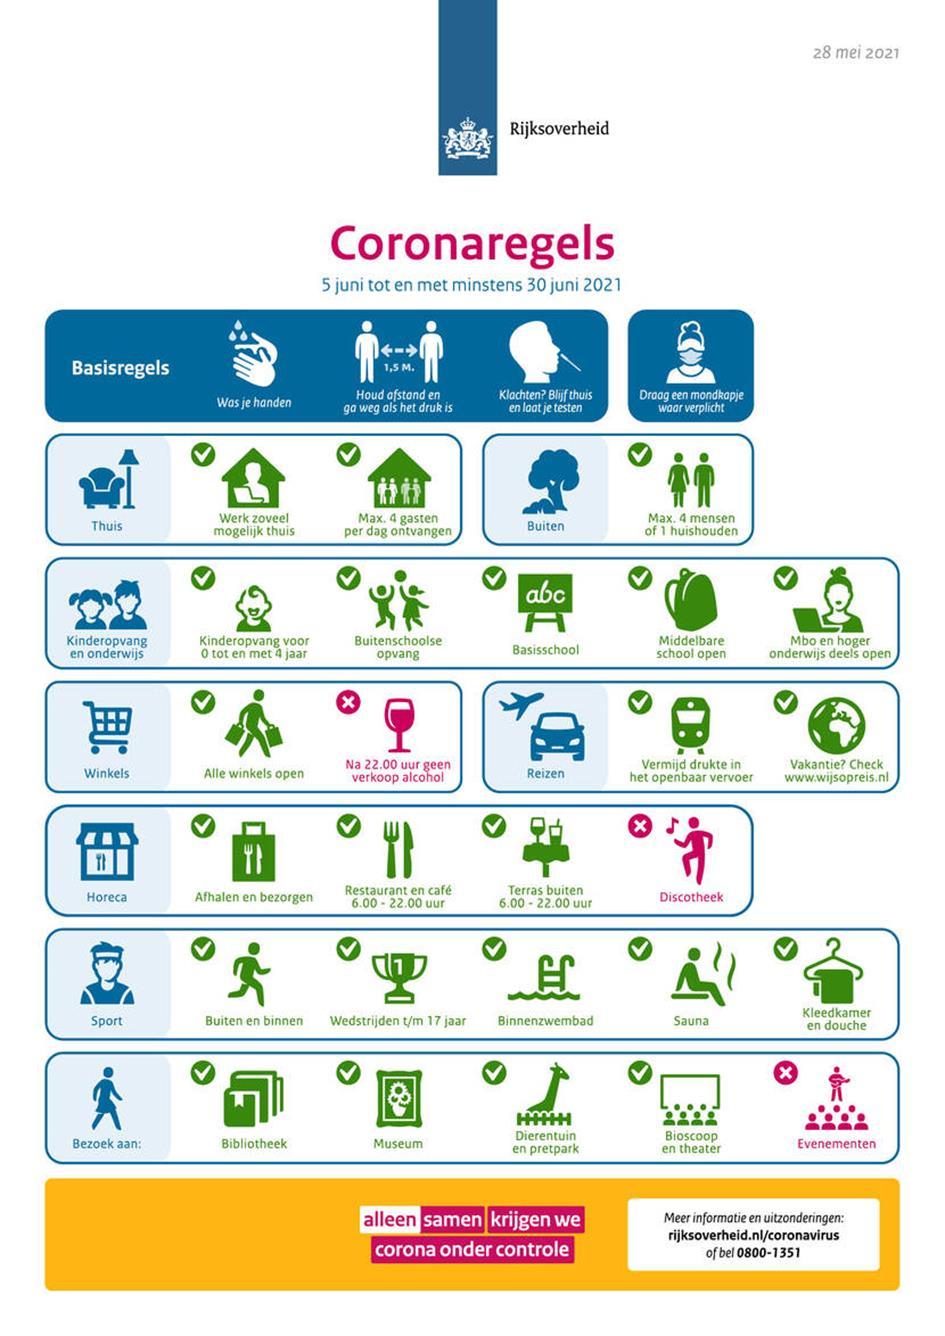 beeldsamenvatting-coronaregels-28-mei-2021.jpg